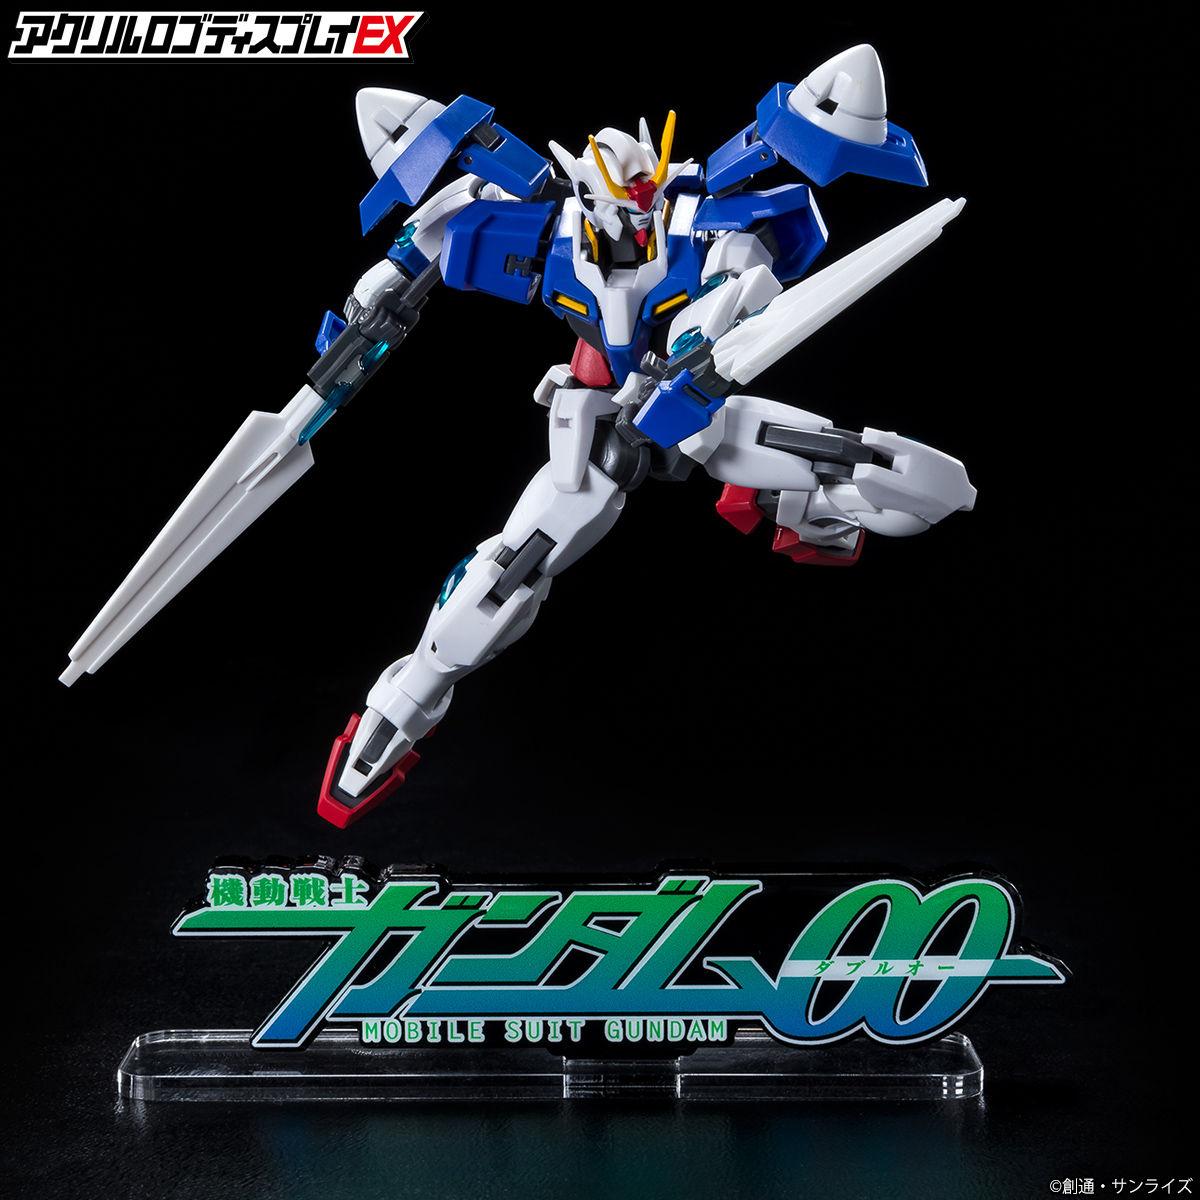 Acrylic Logo Display EX Mobile Suit Gundam 00 [Feb 2022 Delivery]